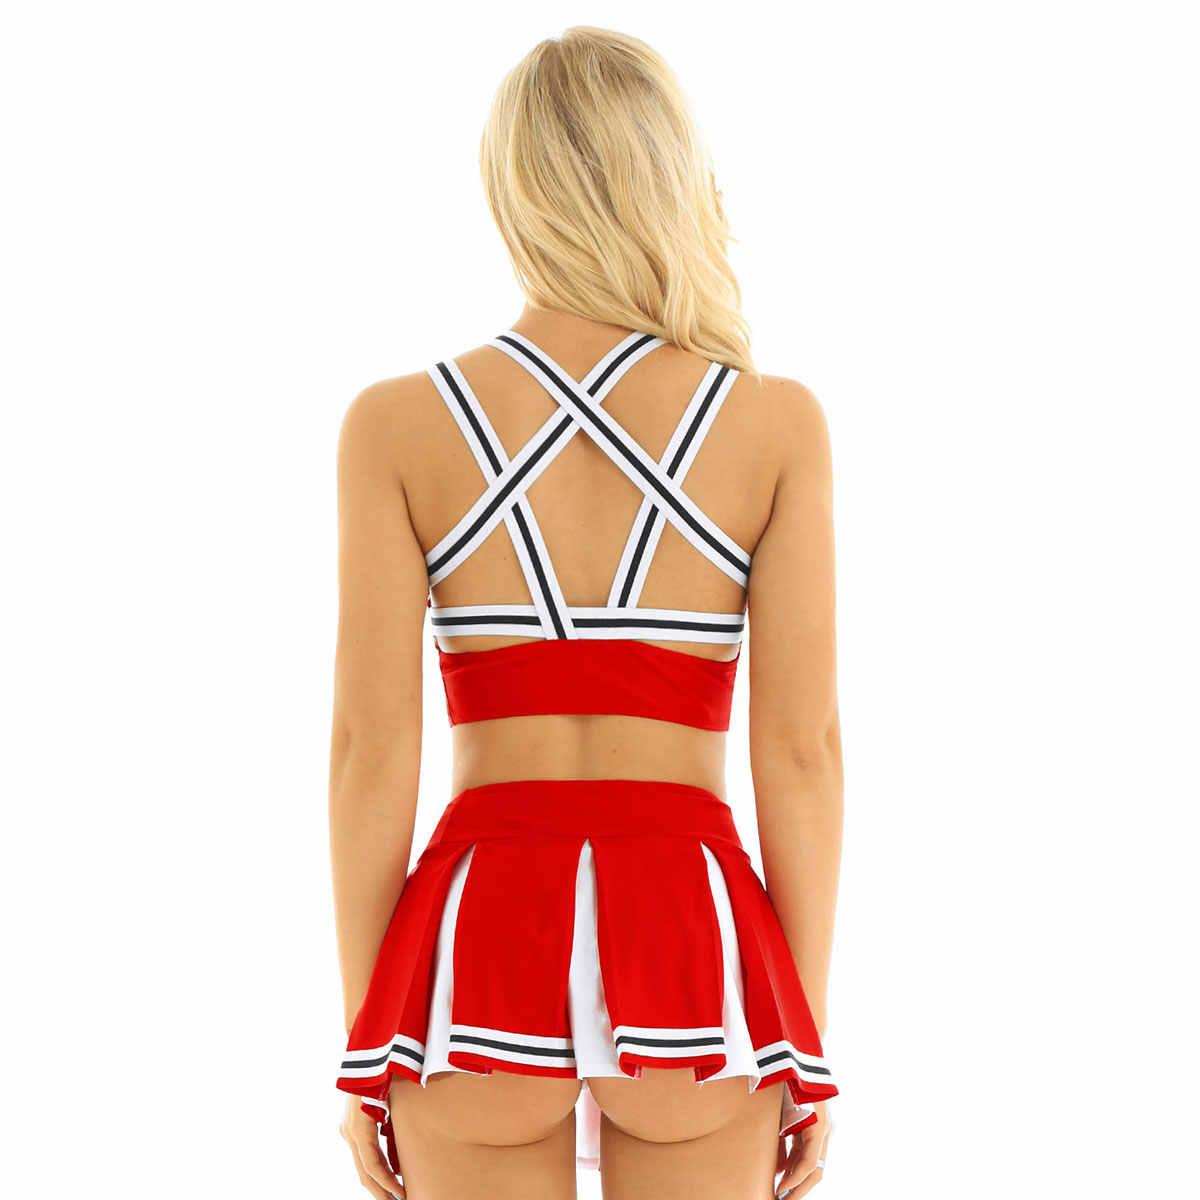 UNS UK LAGER Frauen Japanischen Schülerin Cosplay Uniform Mädchen Sexy Dessous Gleeing Cheerleader Kostüm Set Halloween Kostüm Femme